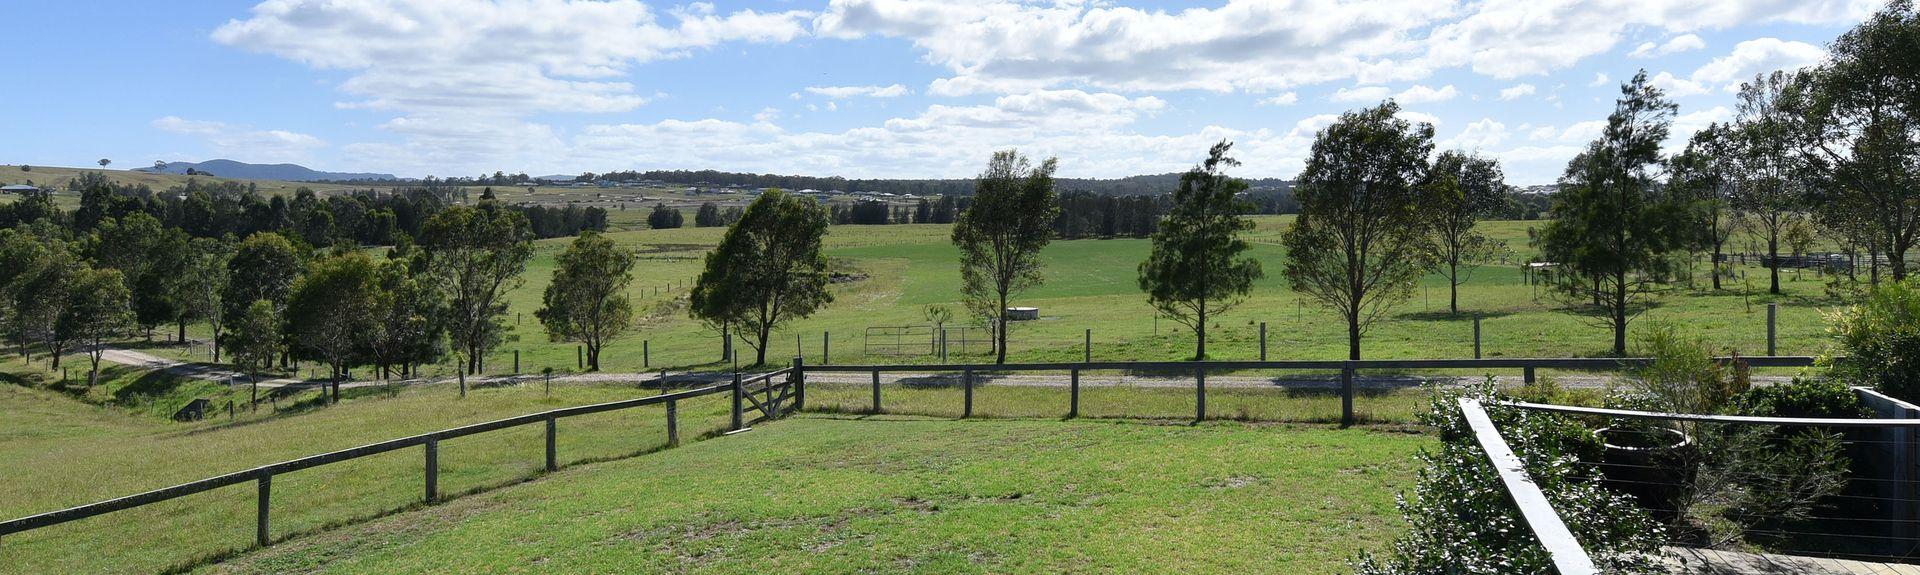 Rosebrook, New South Wales, Australië